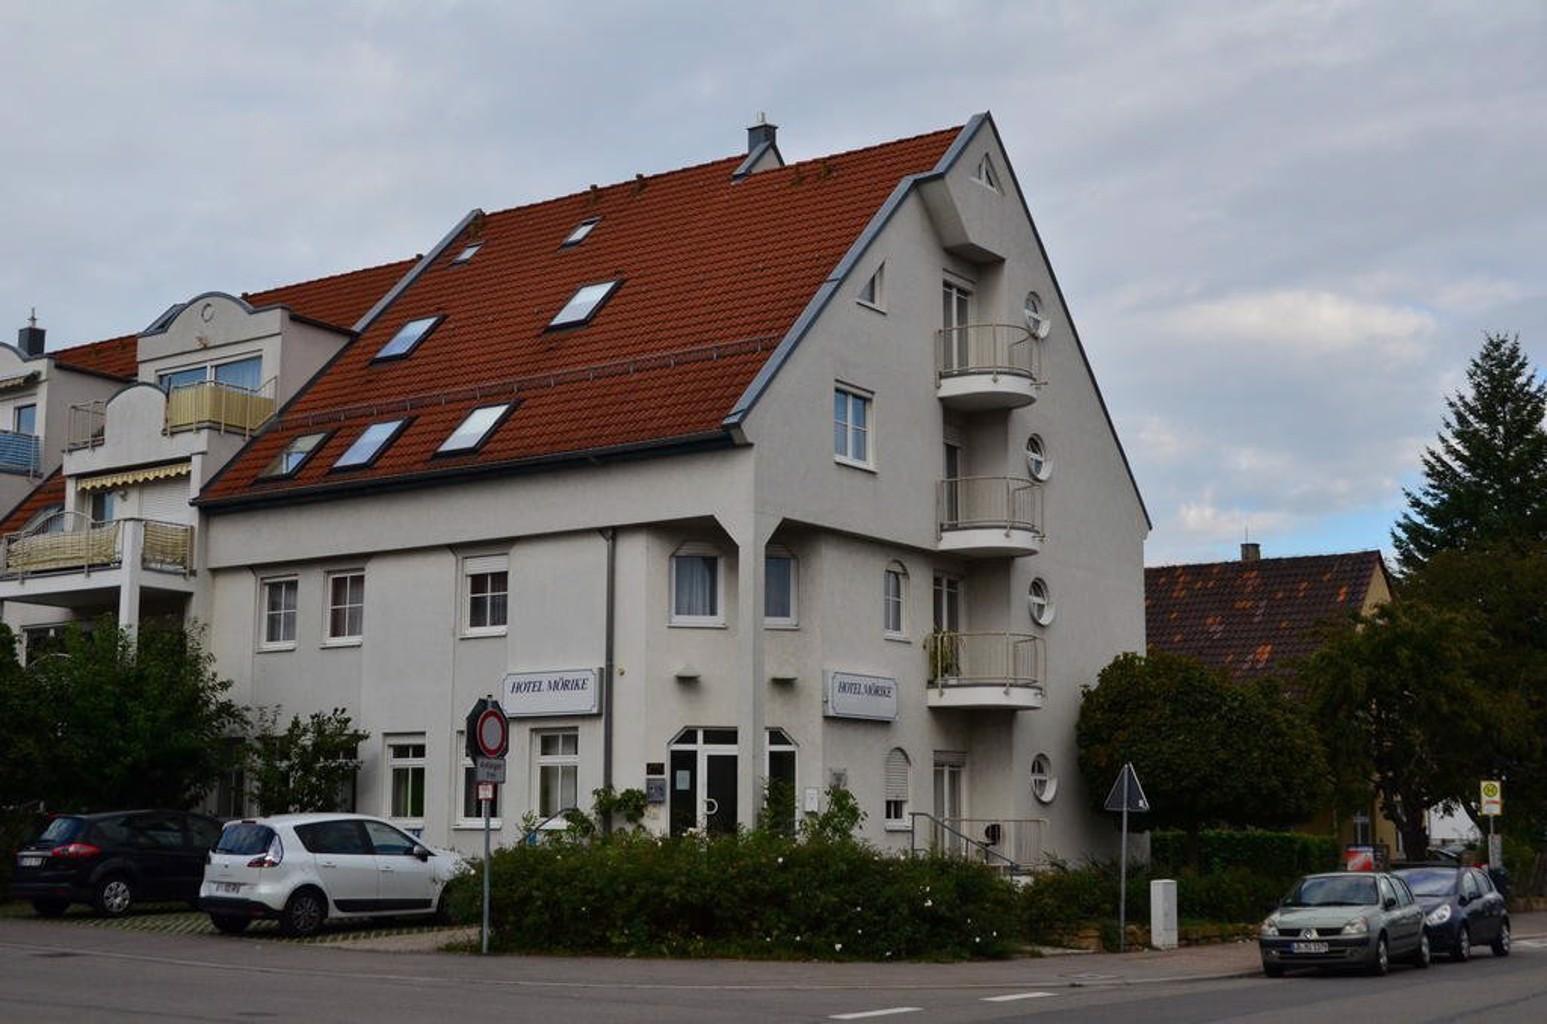 Hotel Morike